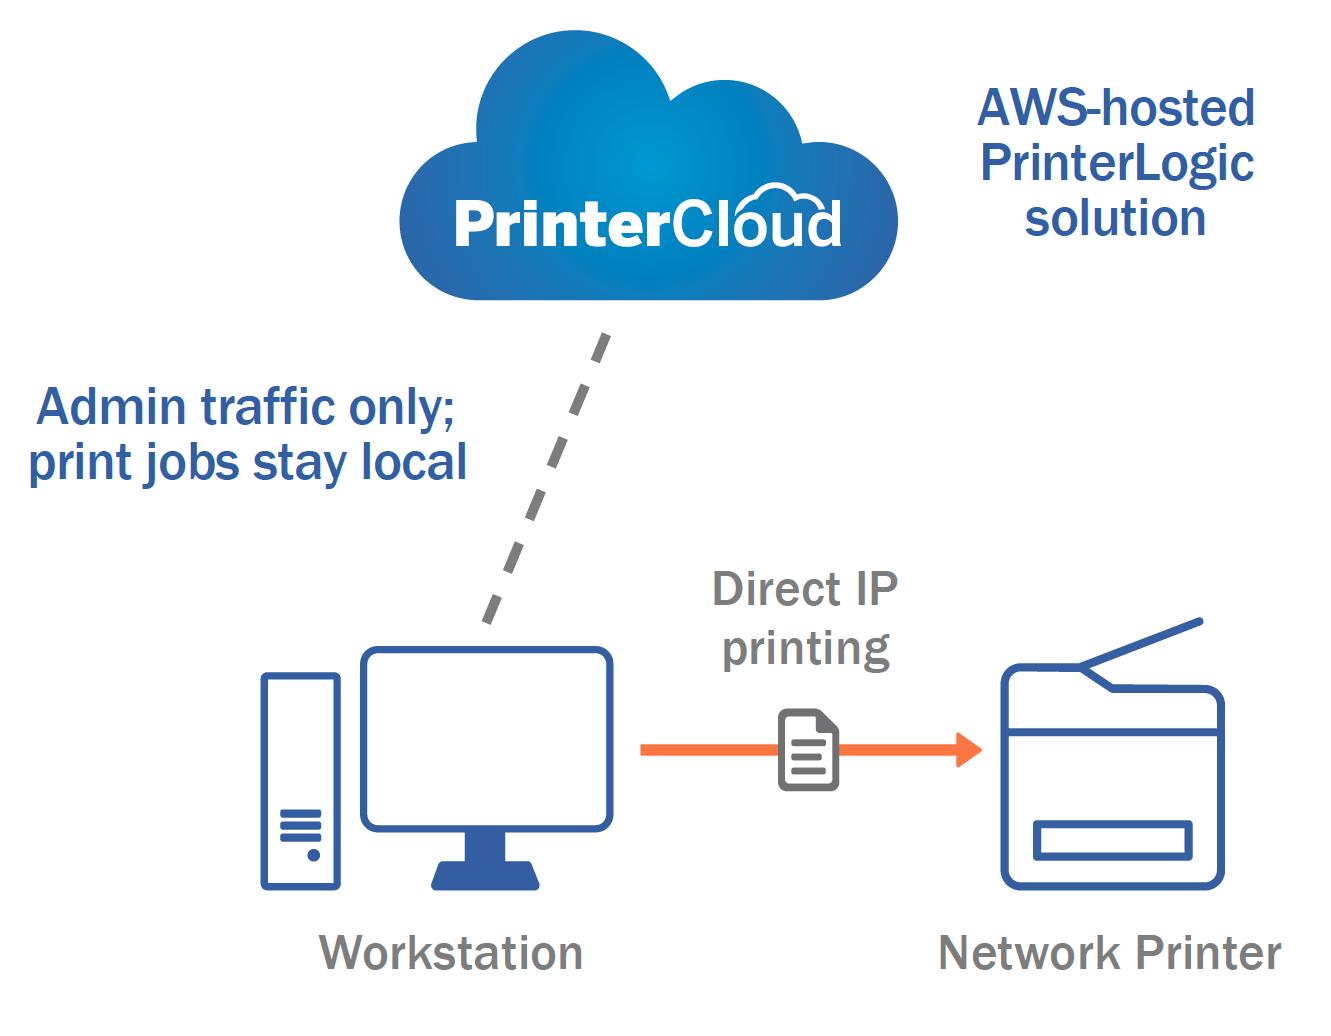 AWS-hosted PrinterLogic Solution